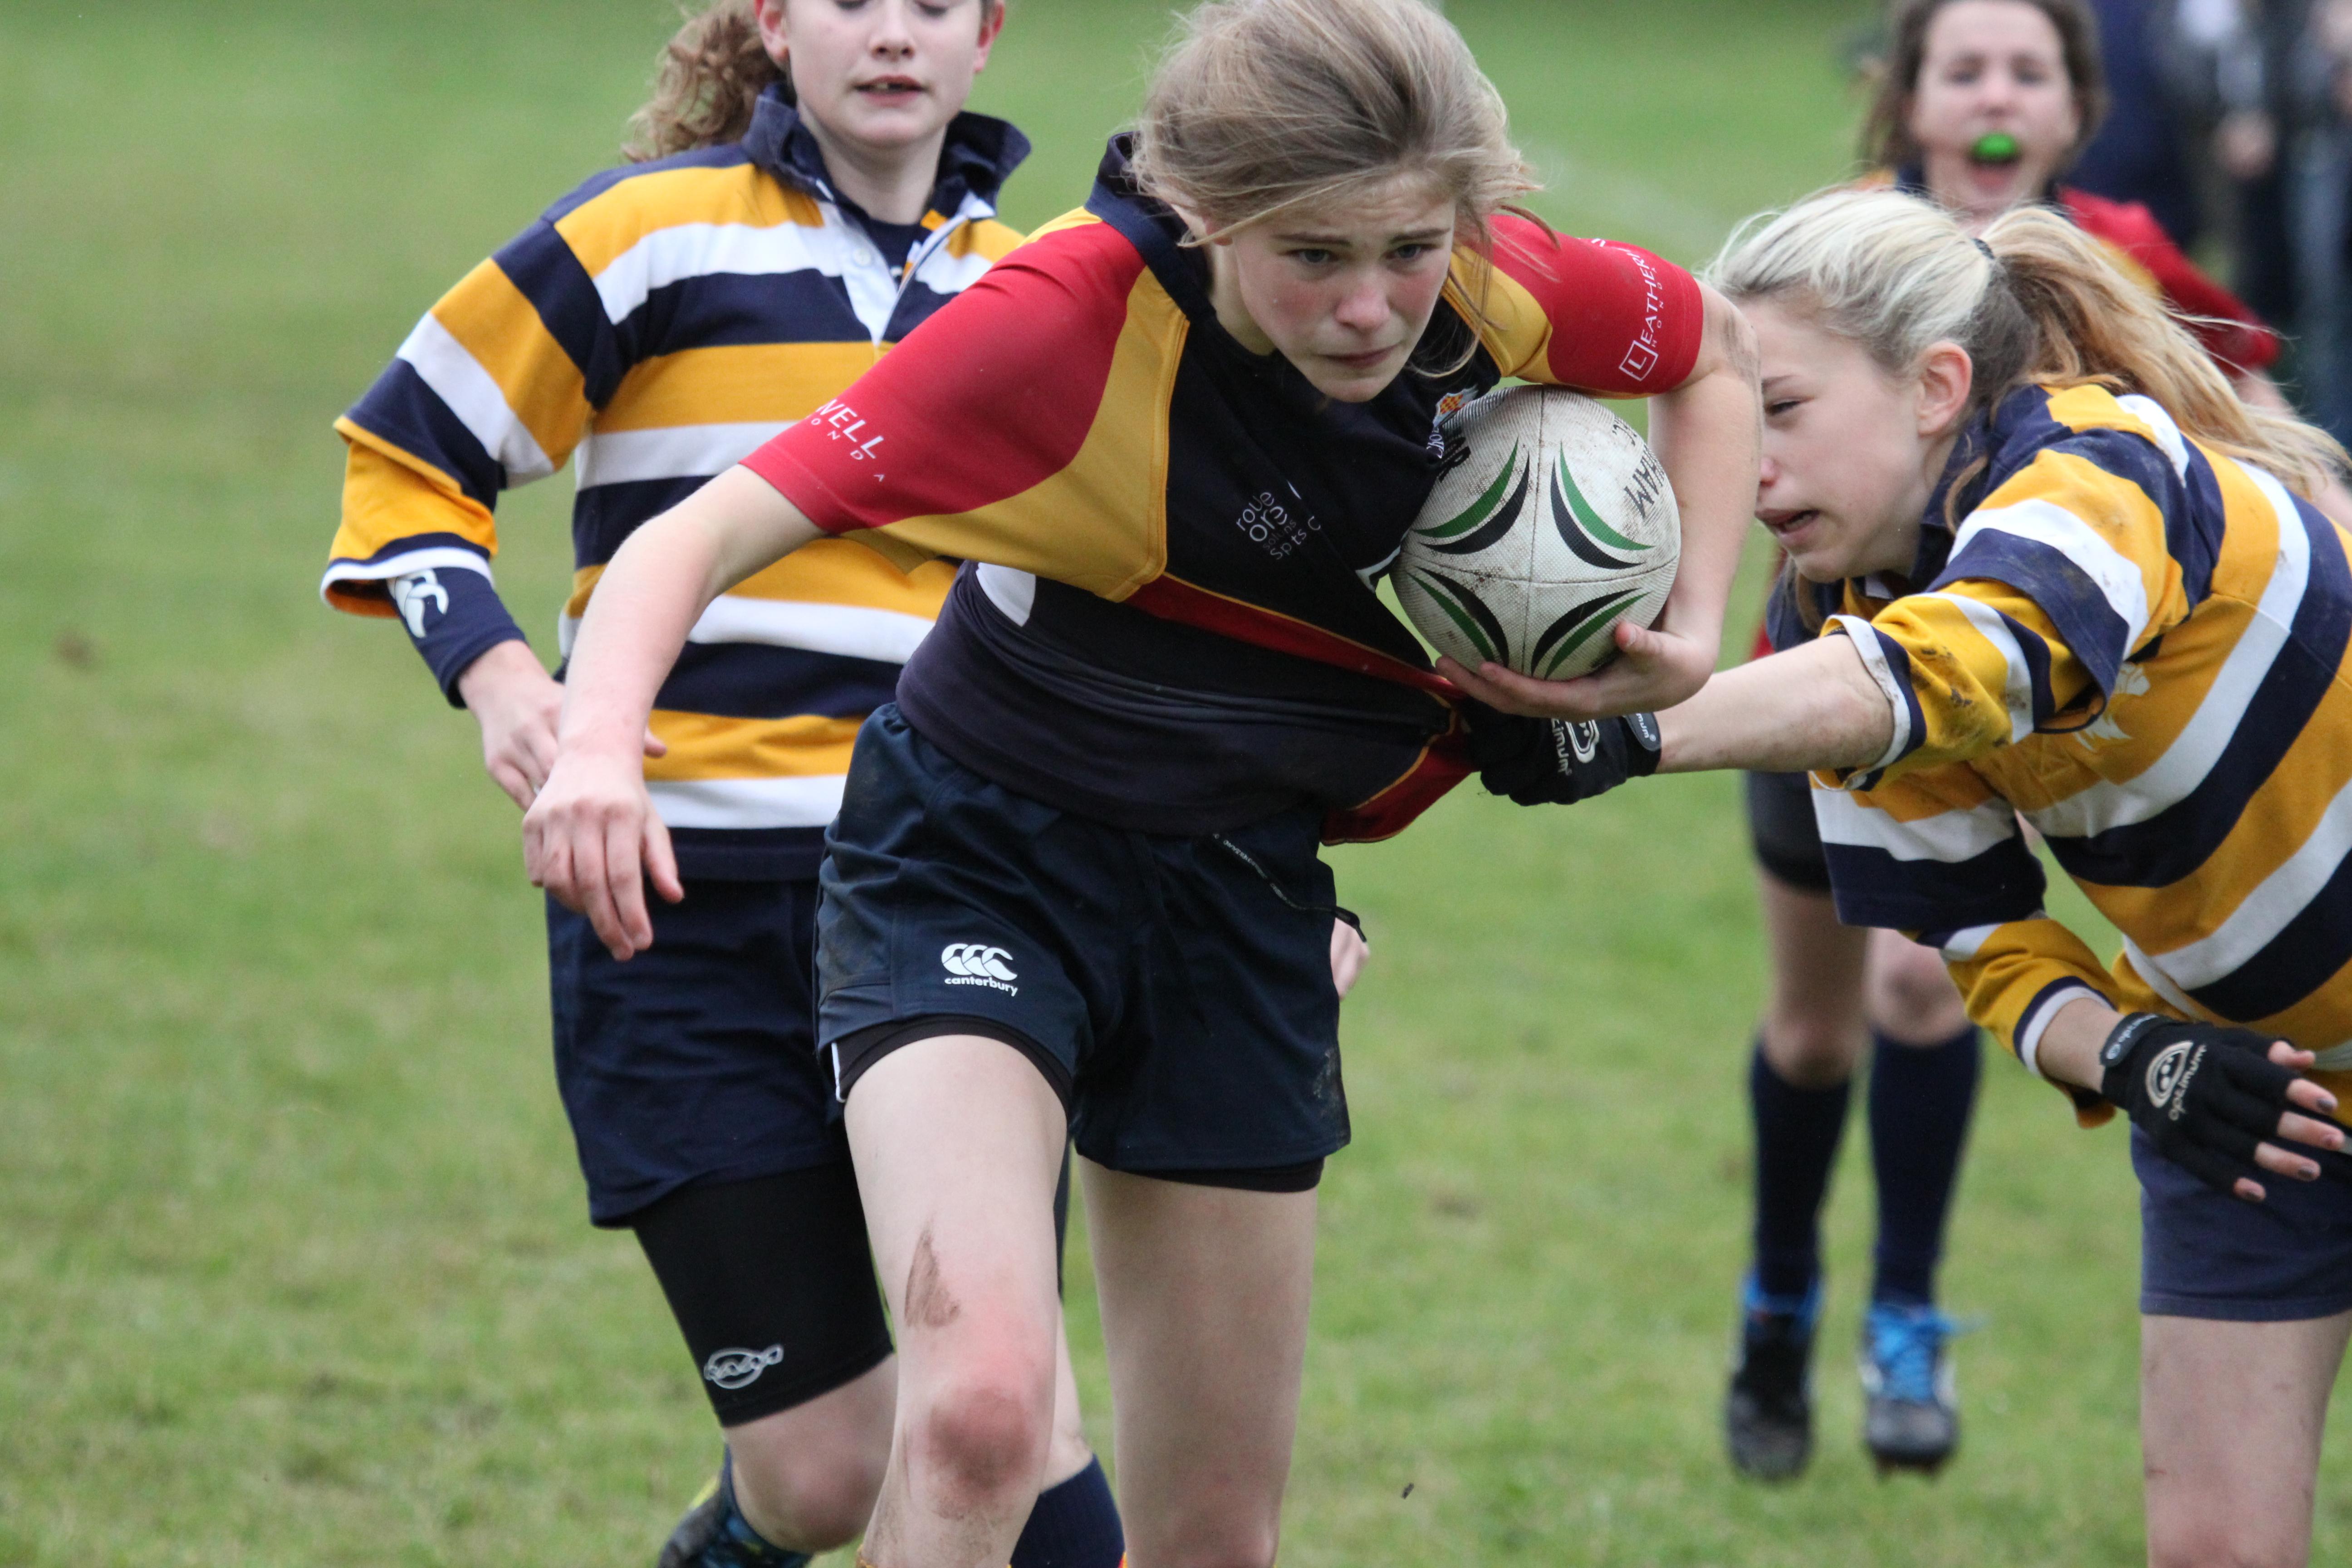 Girls rugby bdsm images 80